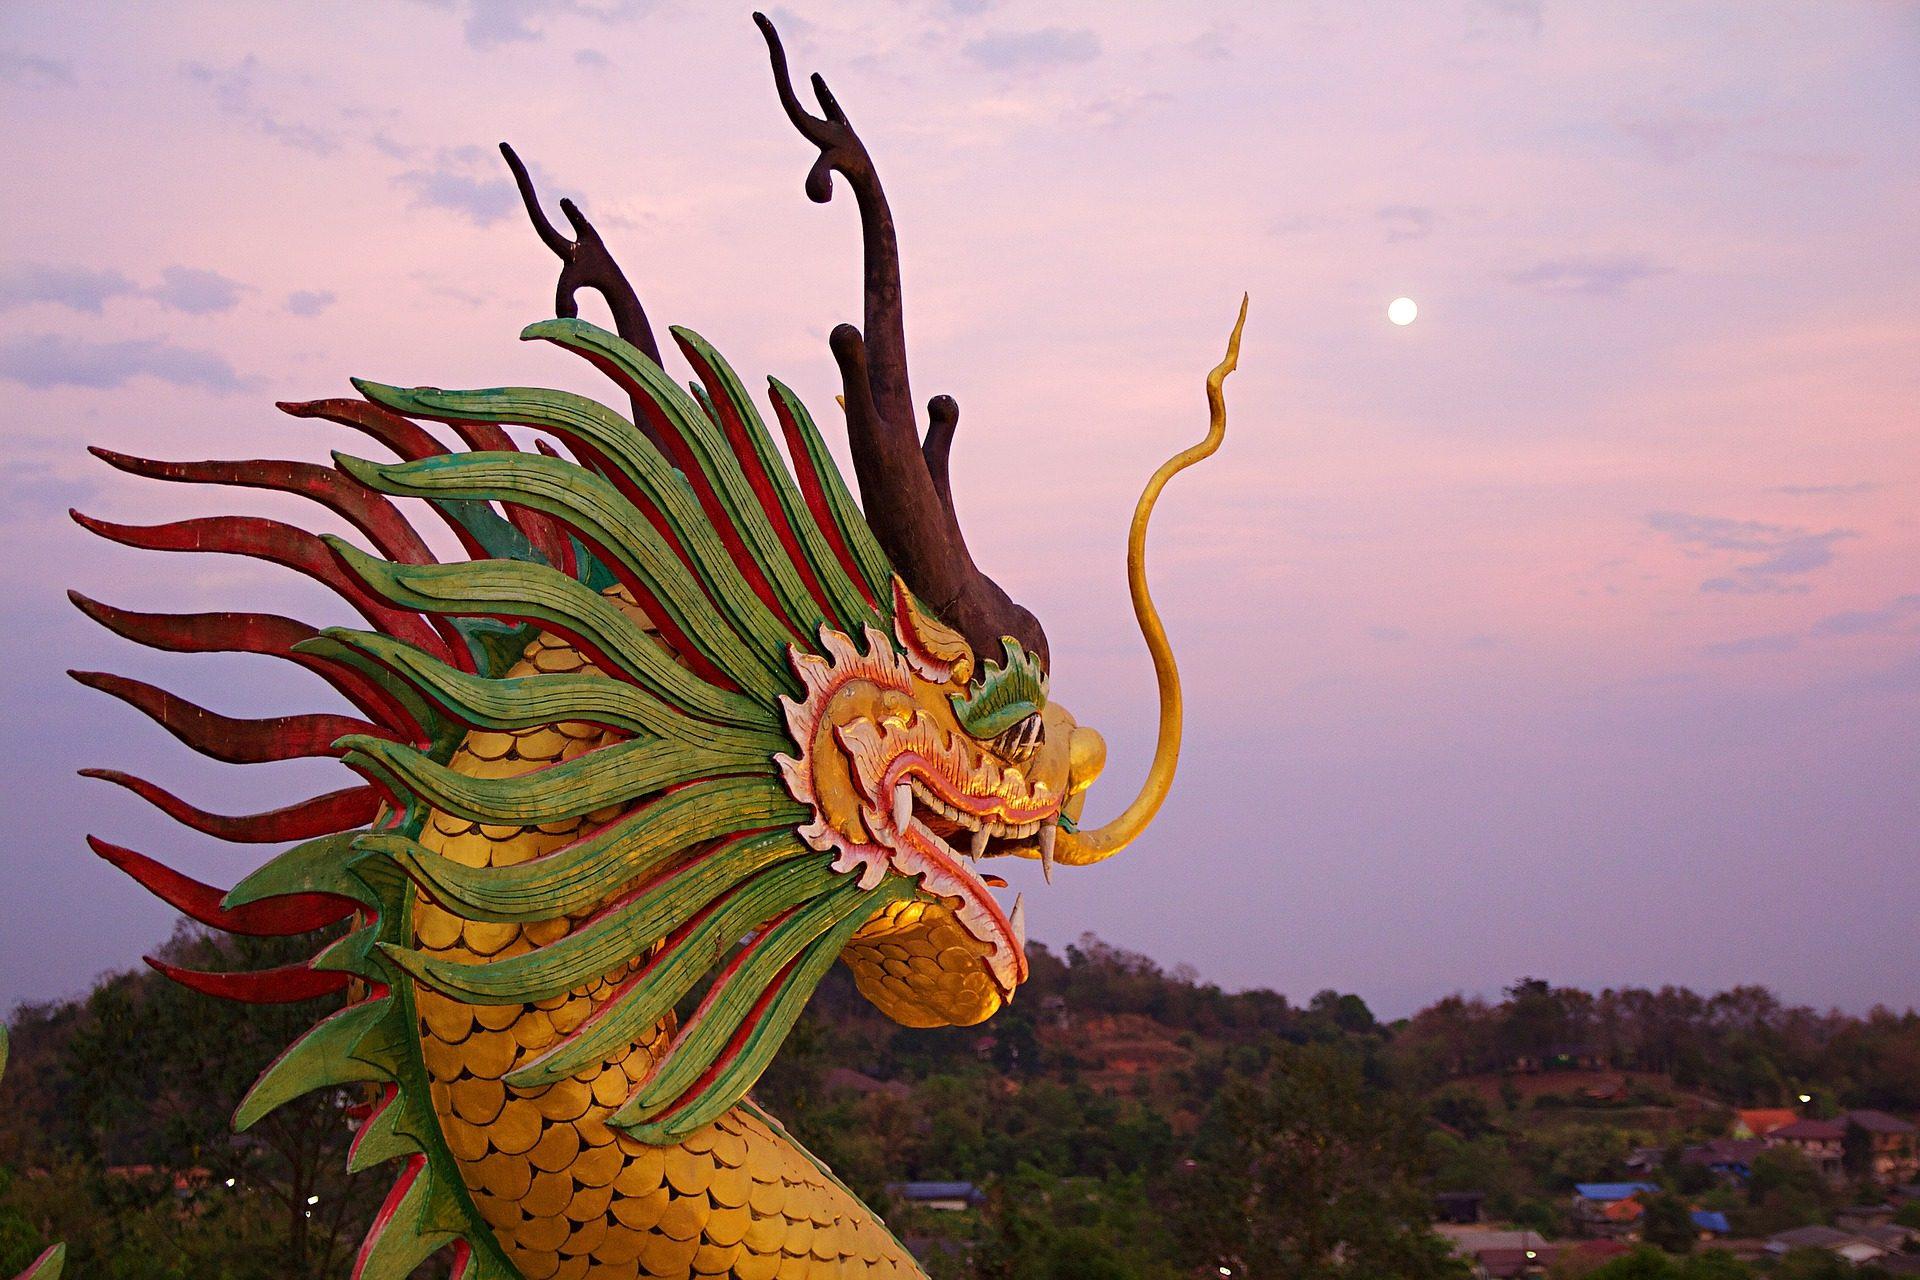 Dragón, Statue, Abbildung, bunte, Thailand - Wallpaper HD - Prof.-falken.com